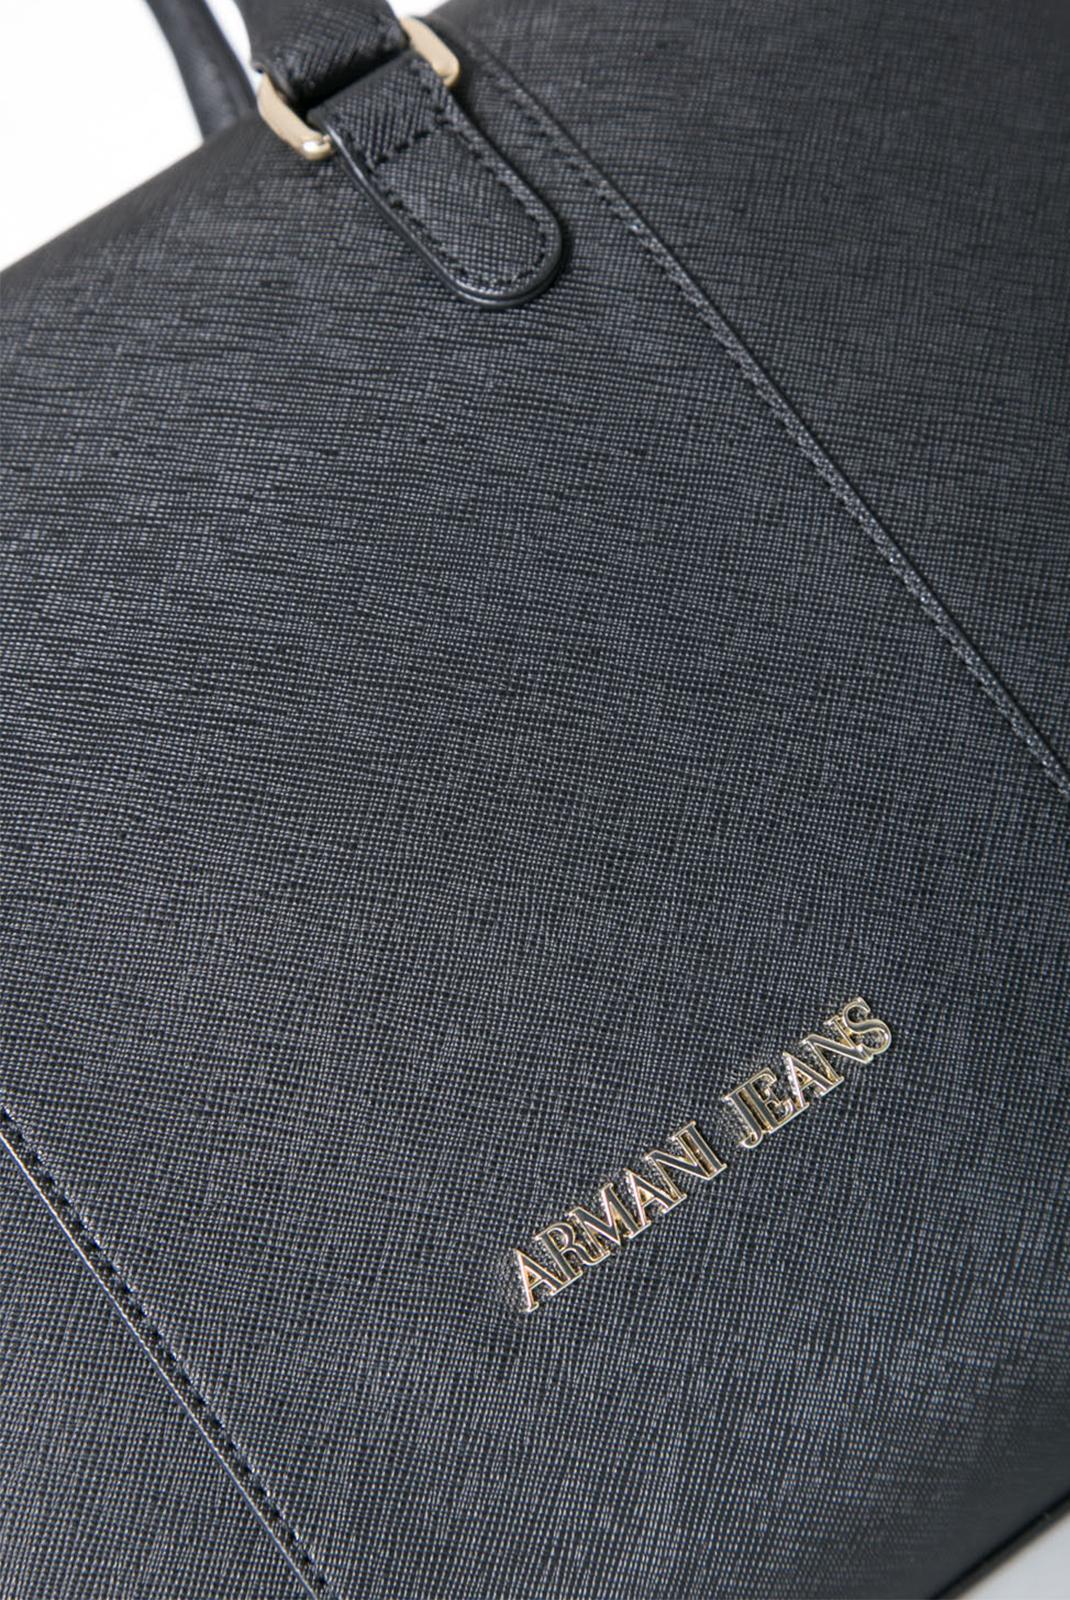 Sacs à Main  Armani jeans 922541 CC857 020 BLACK